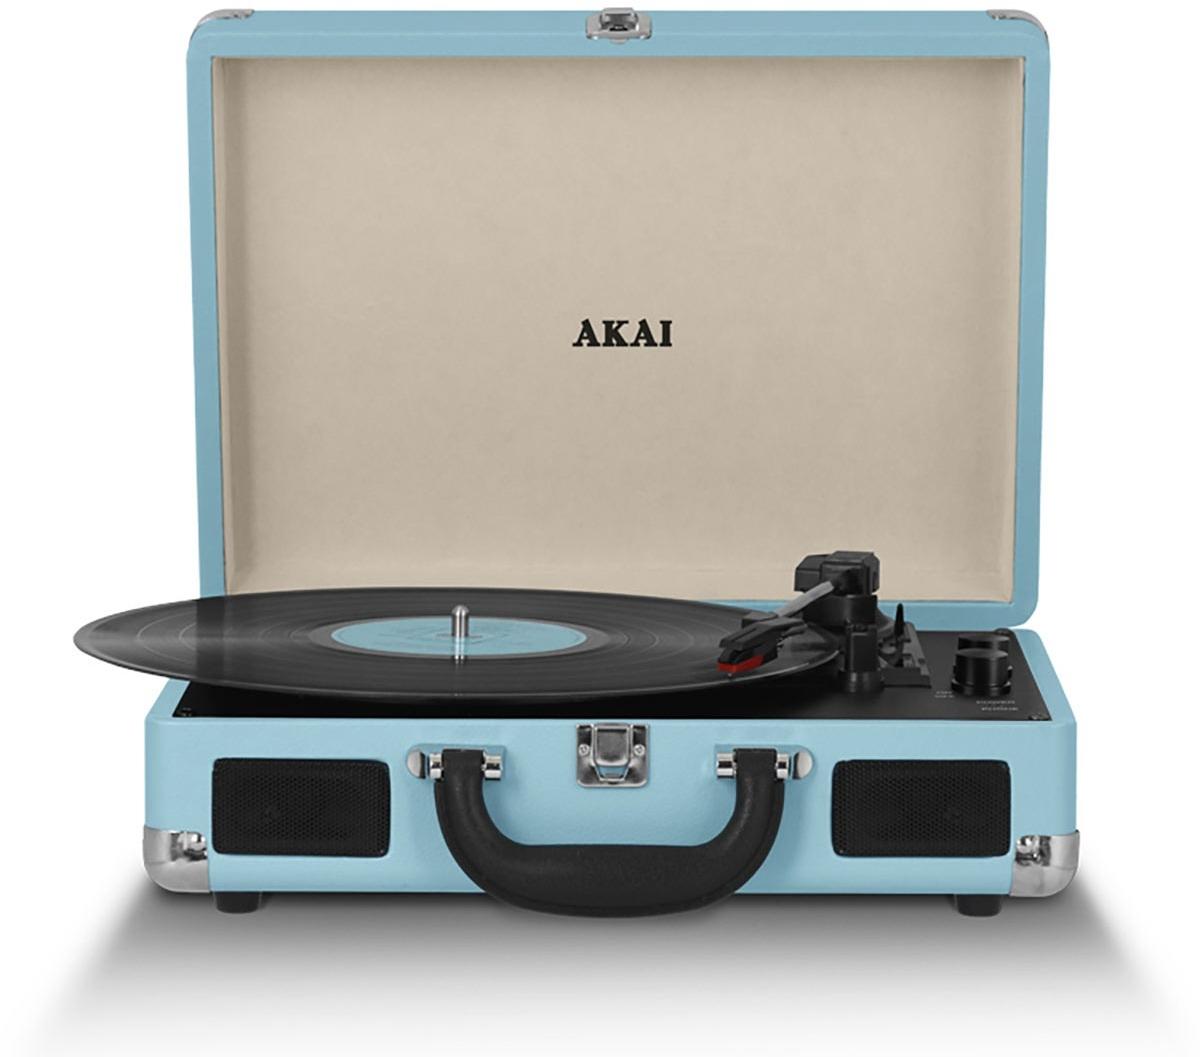 Akai_USB_Turntable_A60011__0_res